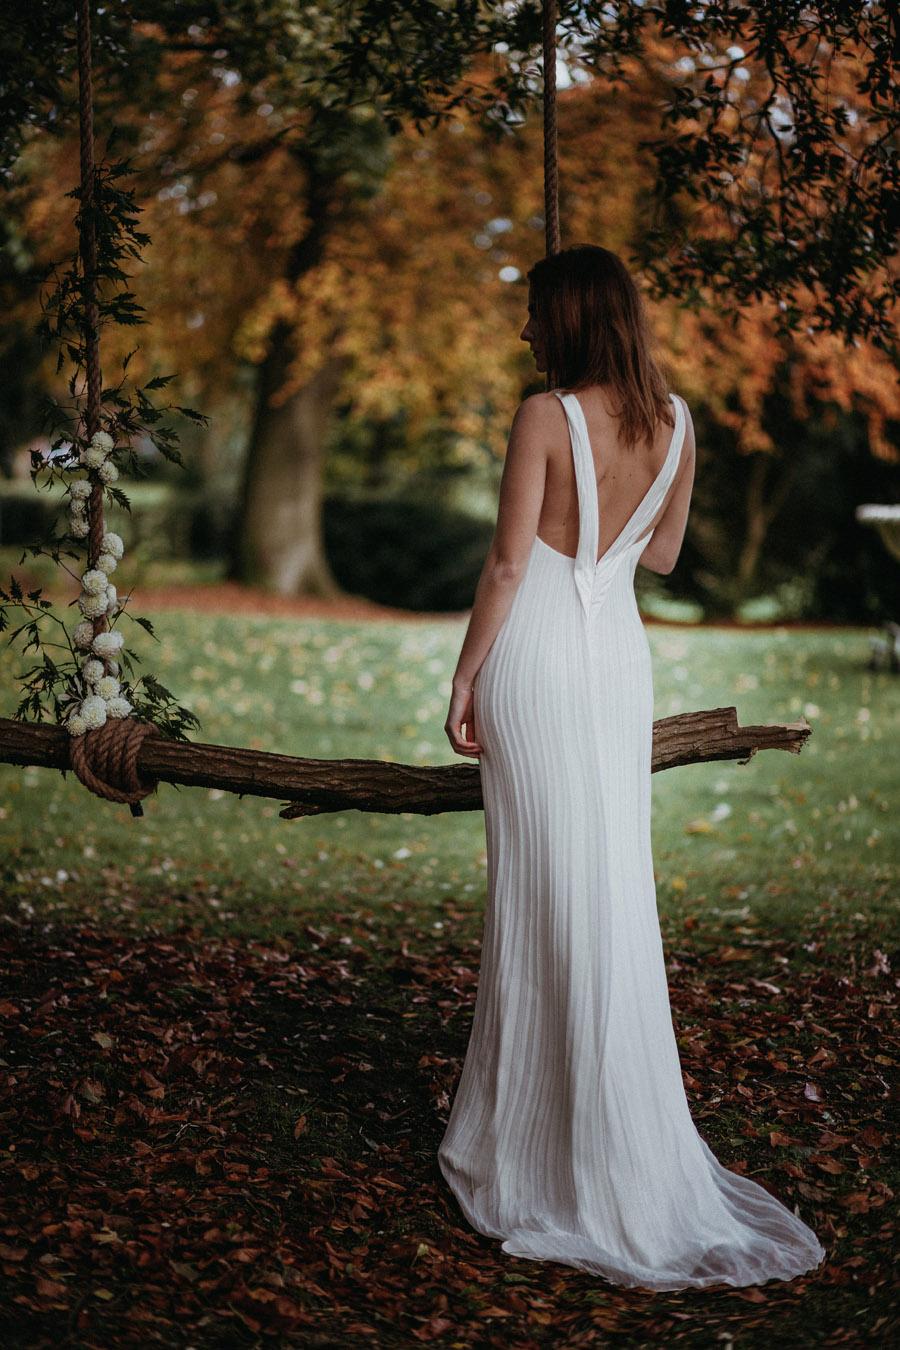 Sanyukta Shrestha autumn daydream bridal collection 2020 (40)